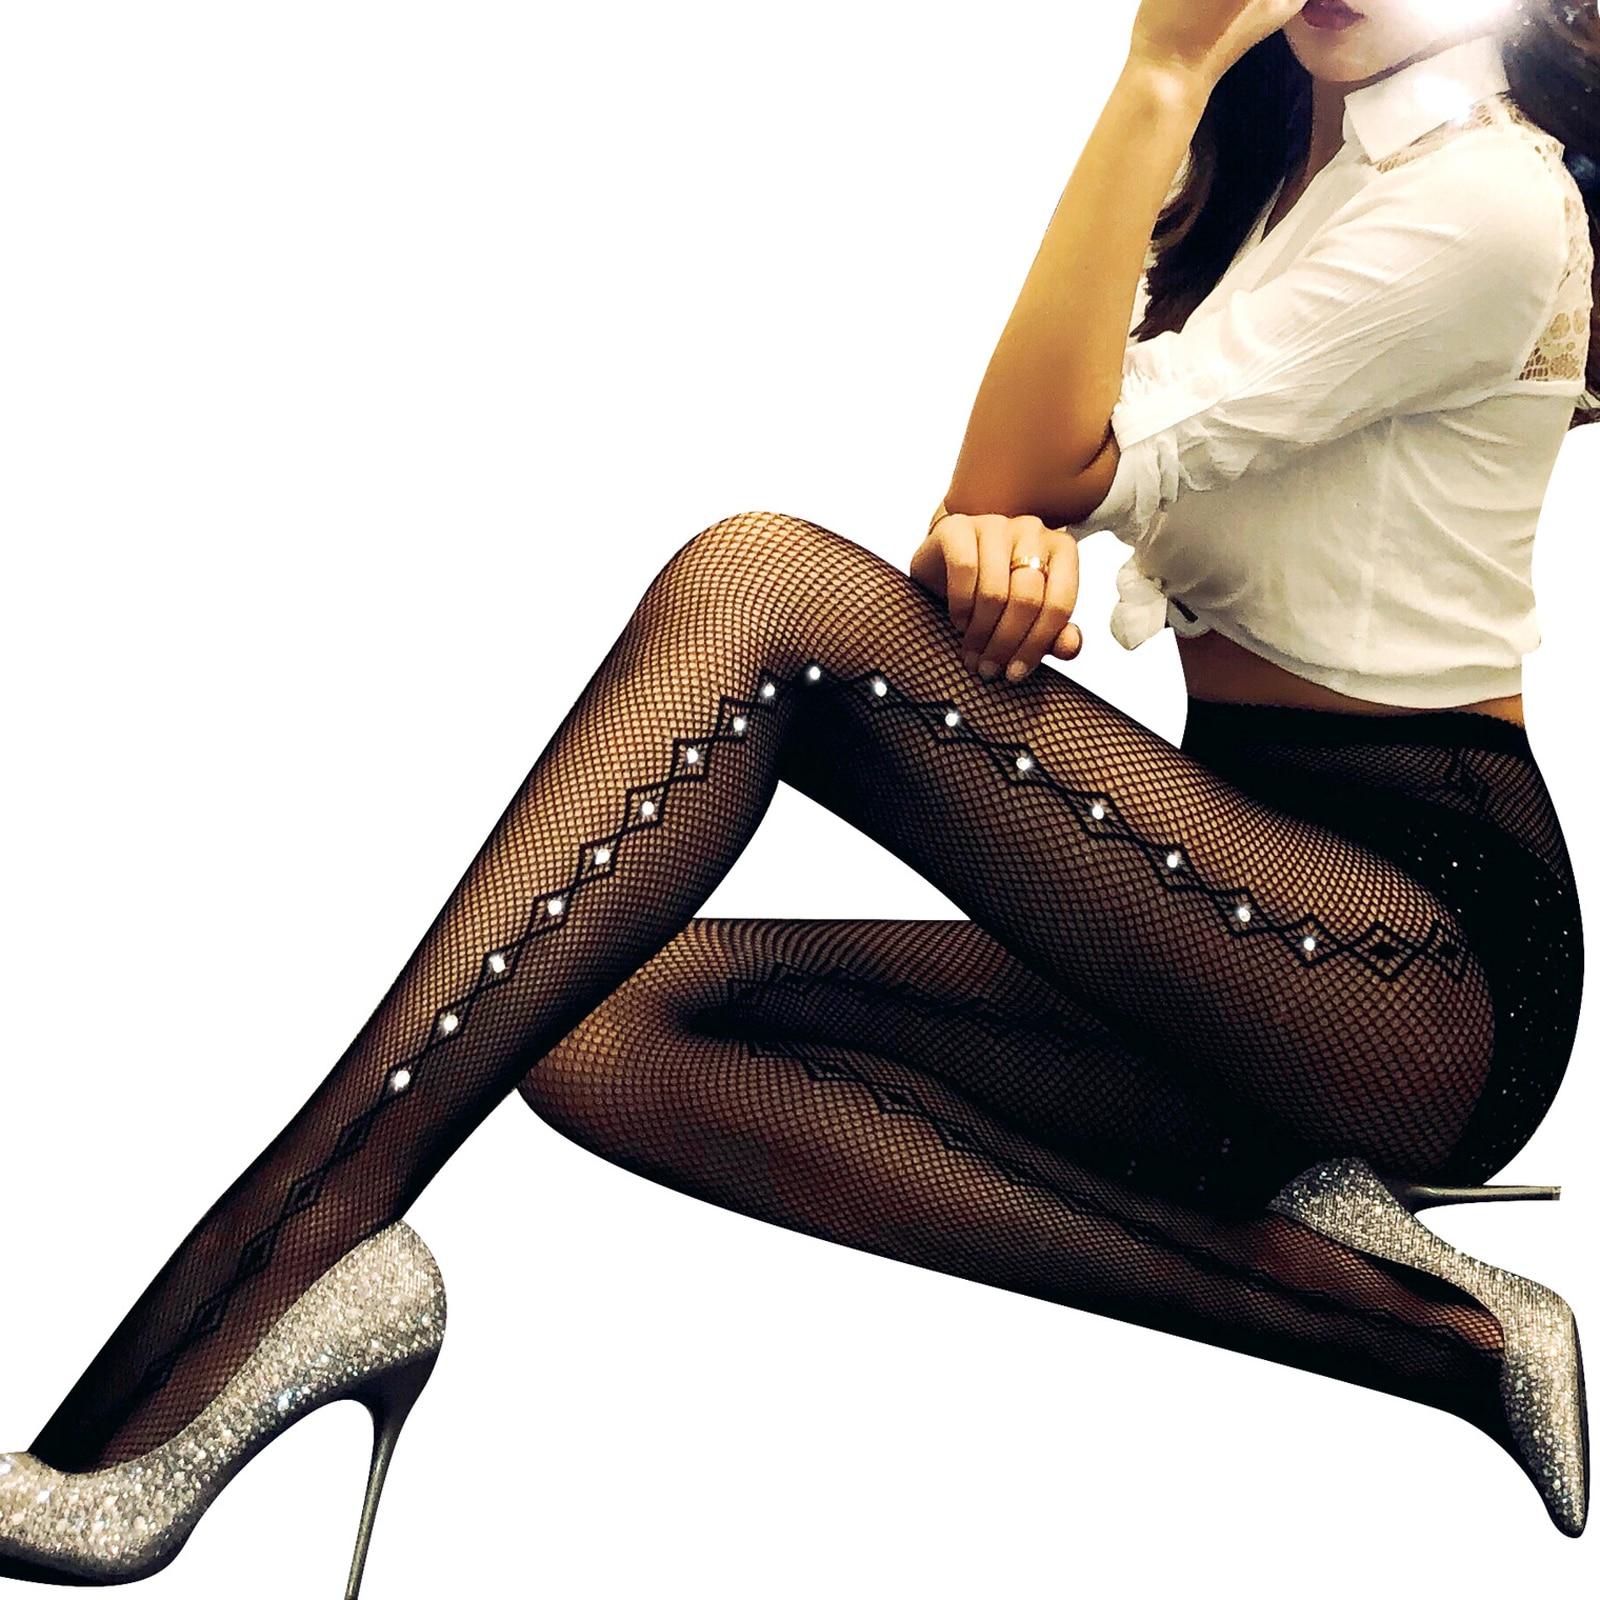 2018 Sexy Women Pantyhose Shiny fishnetstocking High Quality Hollow mesh Diamonds plaid Tights Sparkle Rhinestone stockings